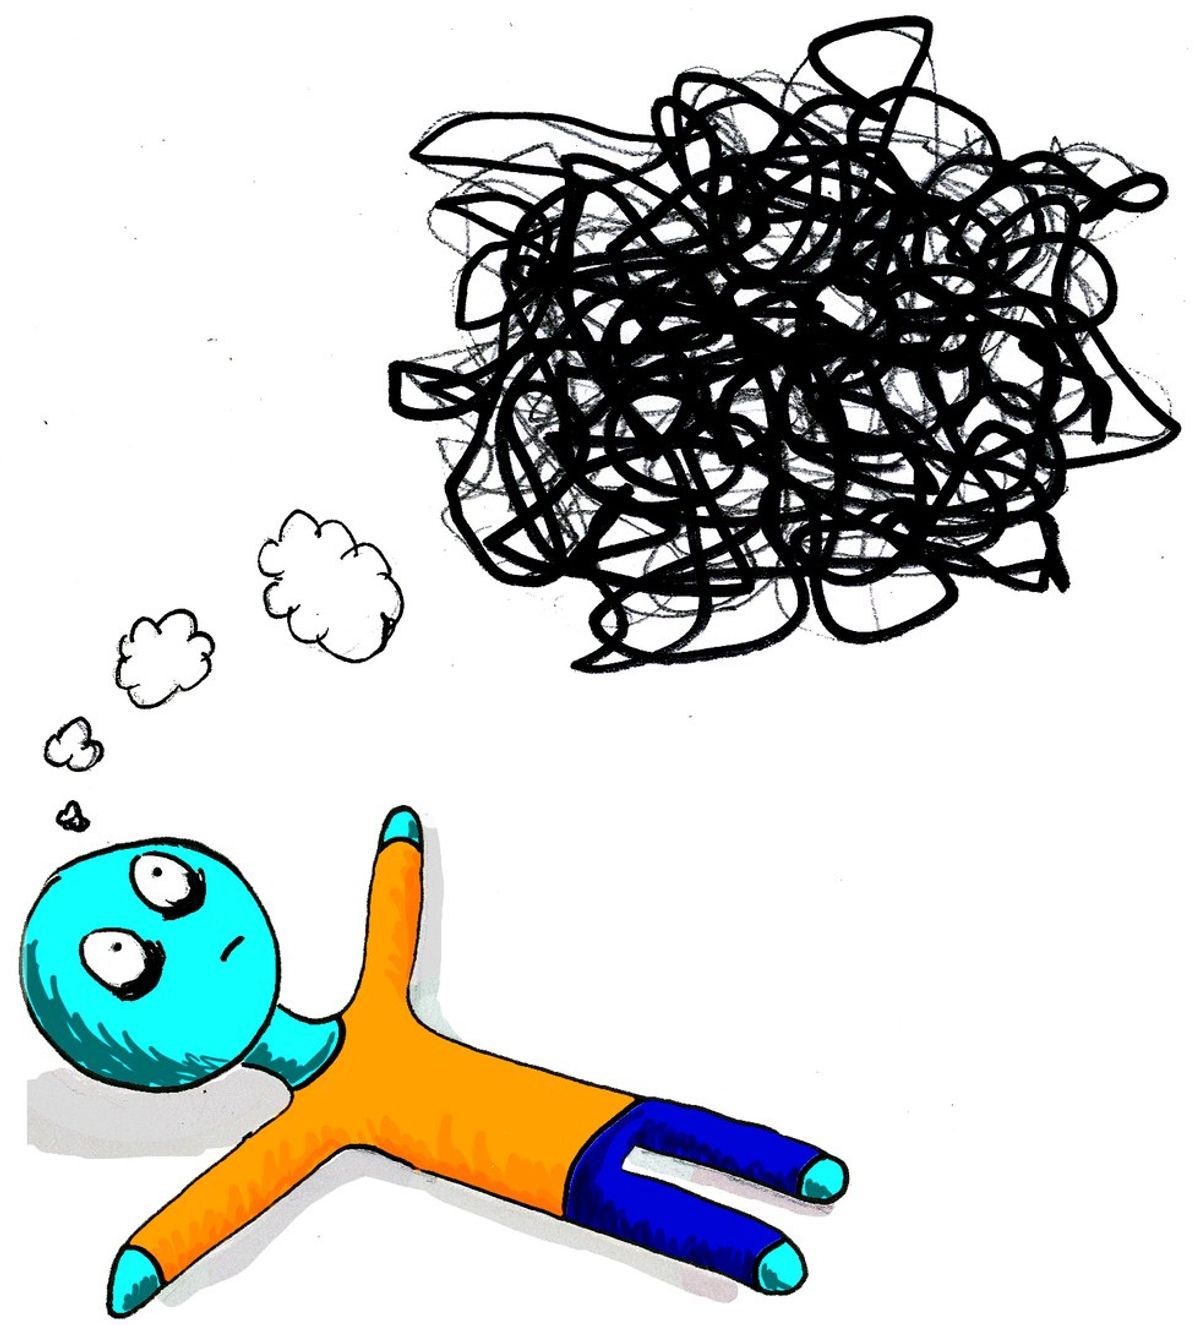 Mid-Semester Anxiety Crisis